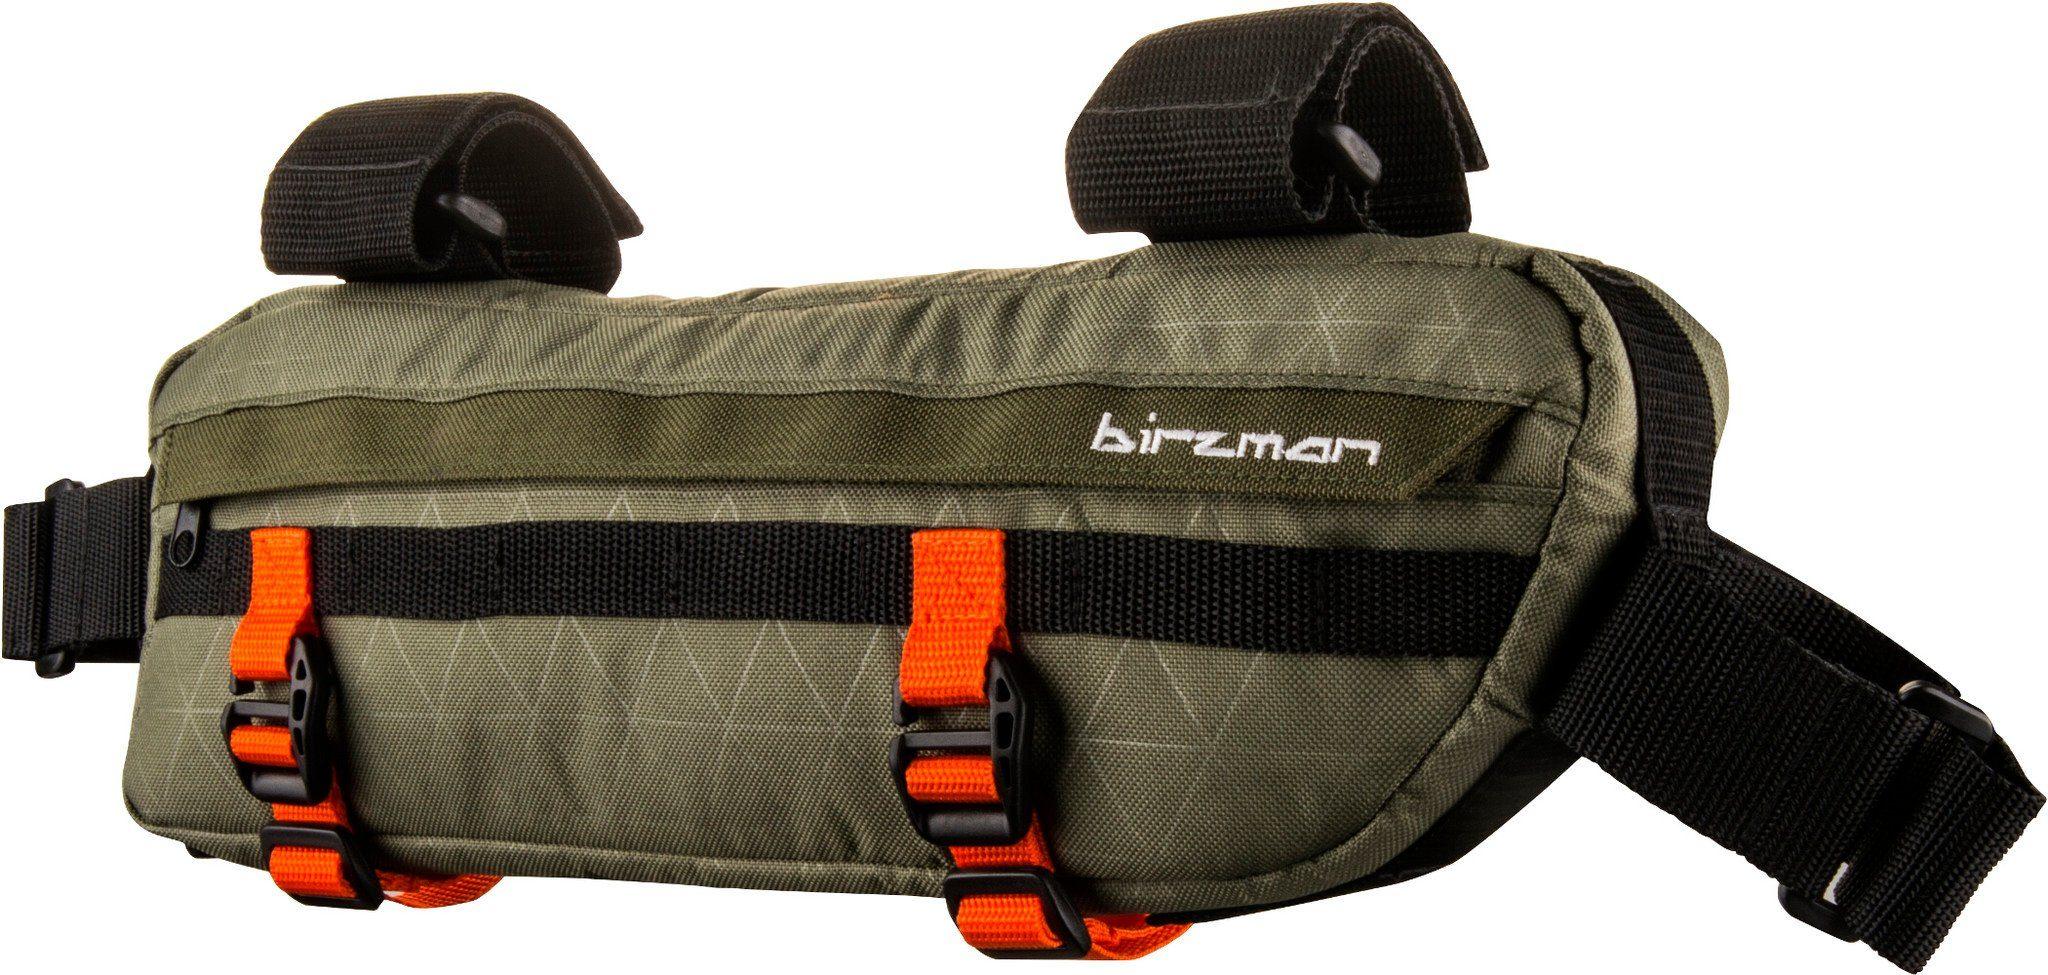 Birzman Fahrradtasche »Packman Travel Planet Frame Pack«